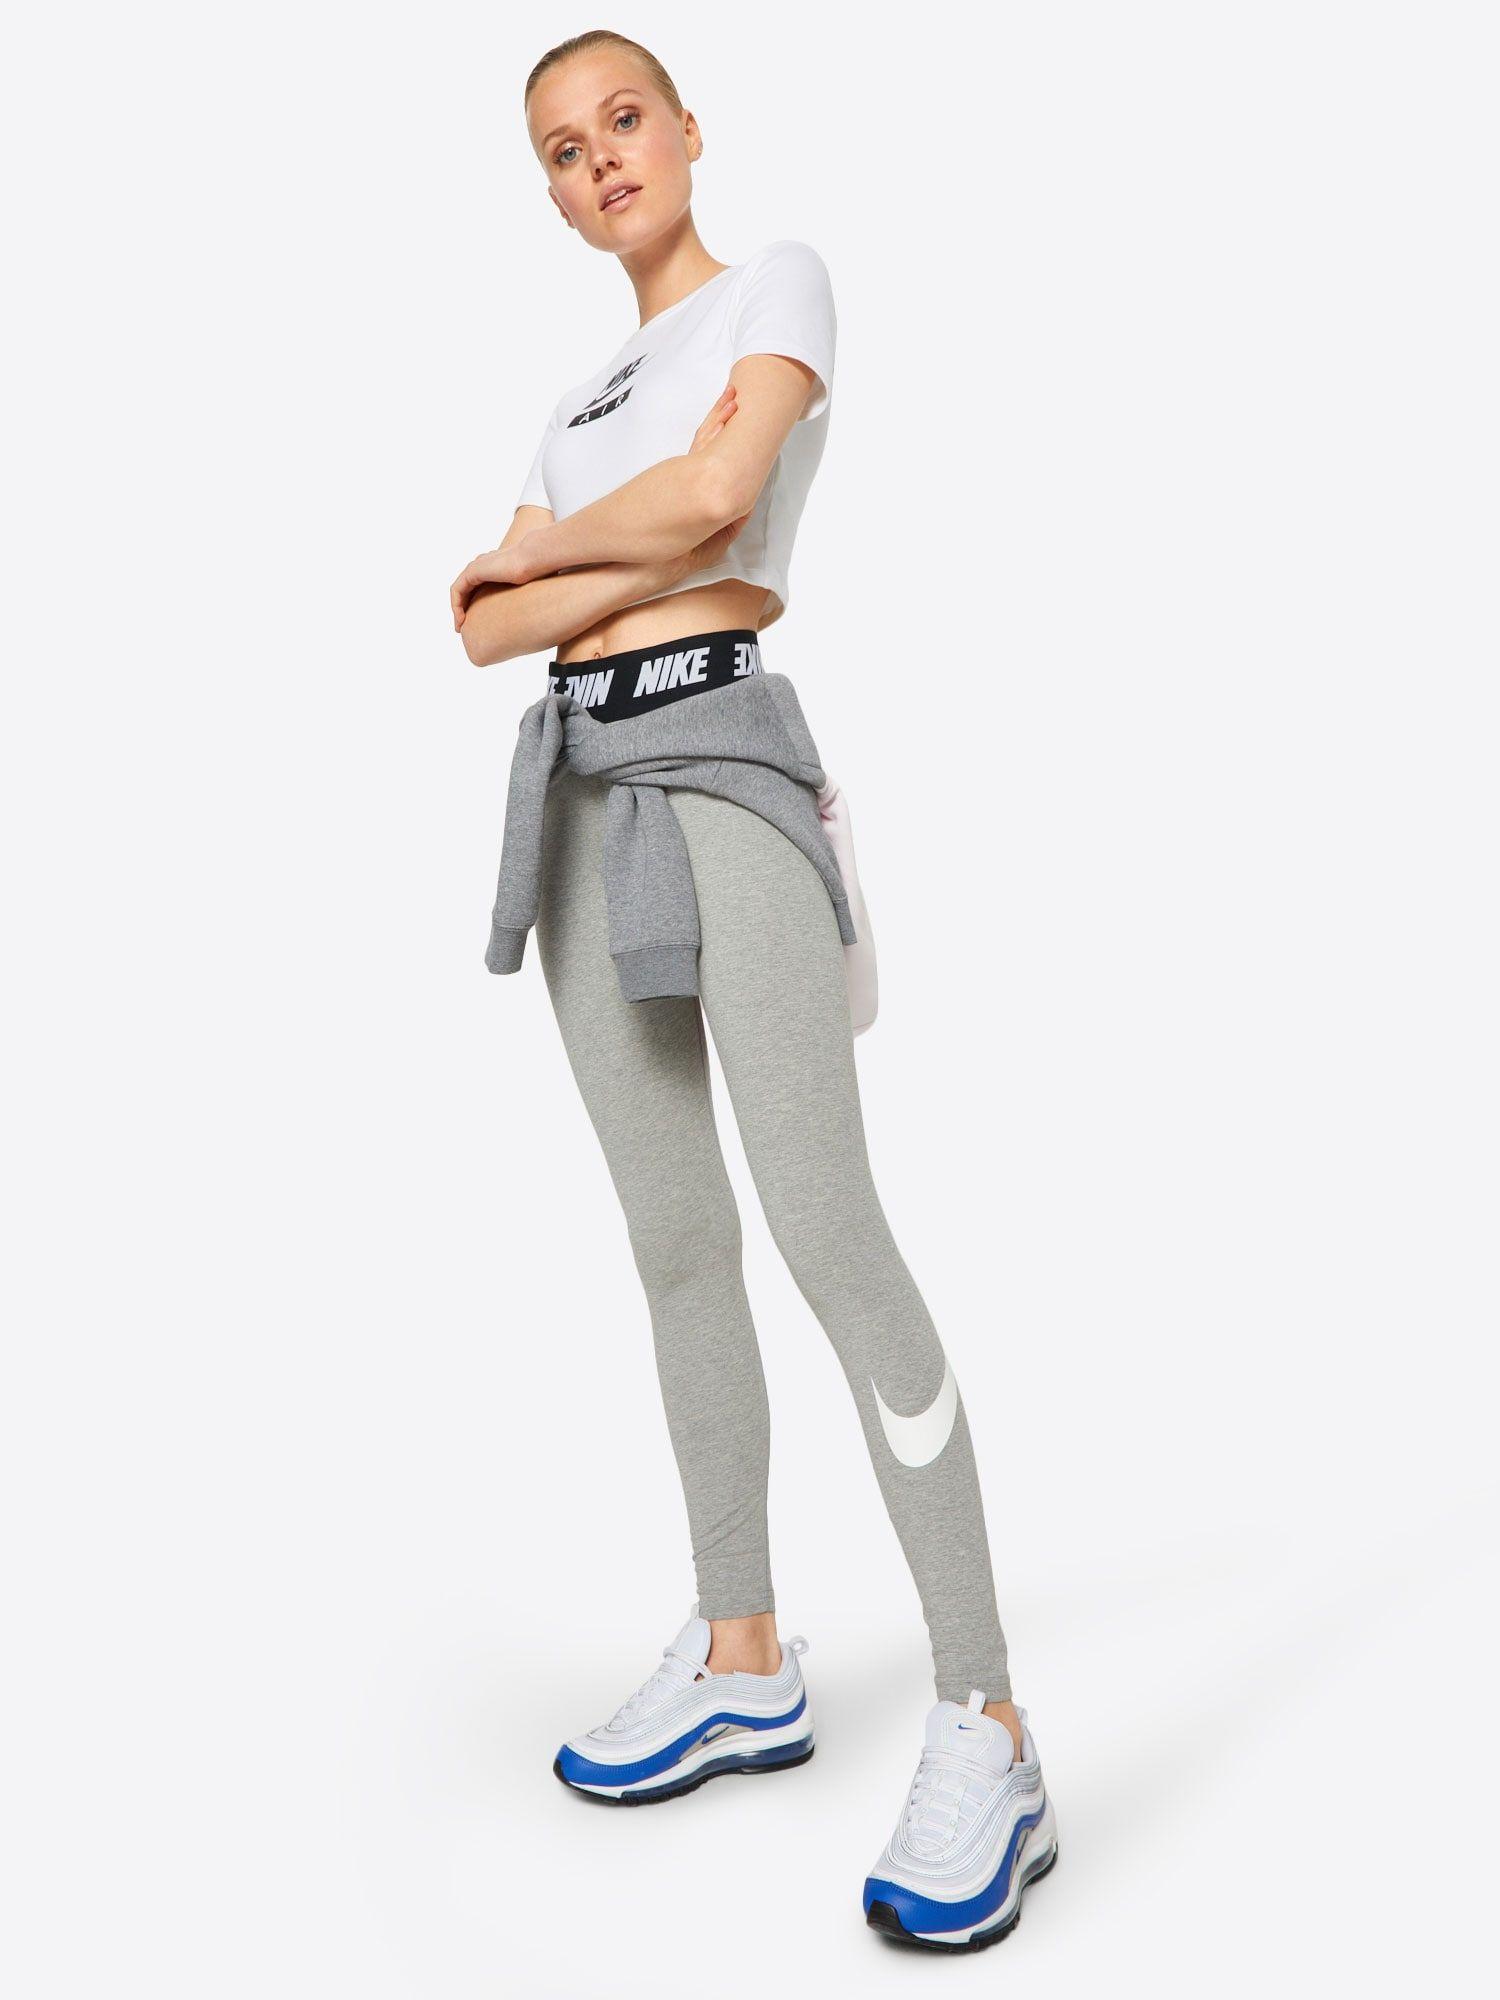 Nike Sportswear Leggings Damen Grau Schwarz Weiss Grosse M Nike Sportbekleidung Nike Sportswear Und Nike